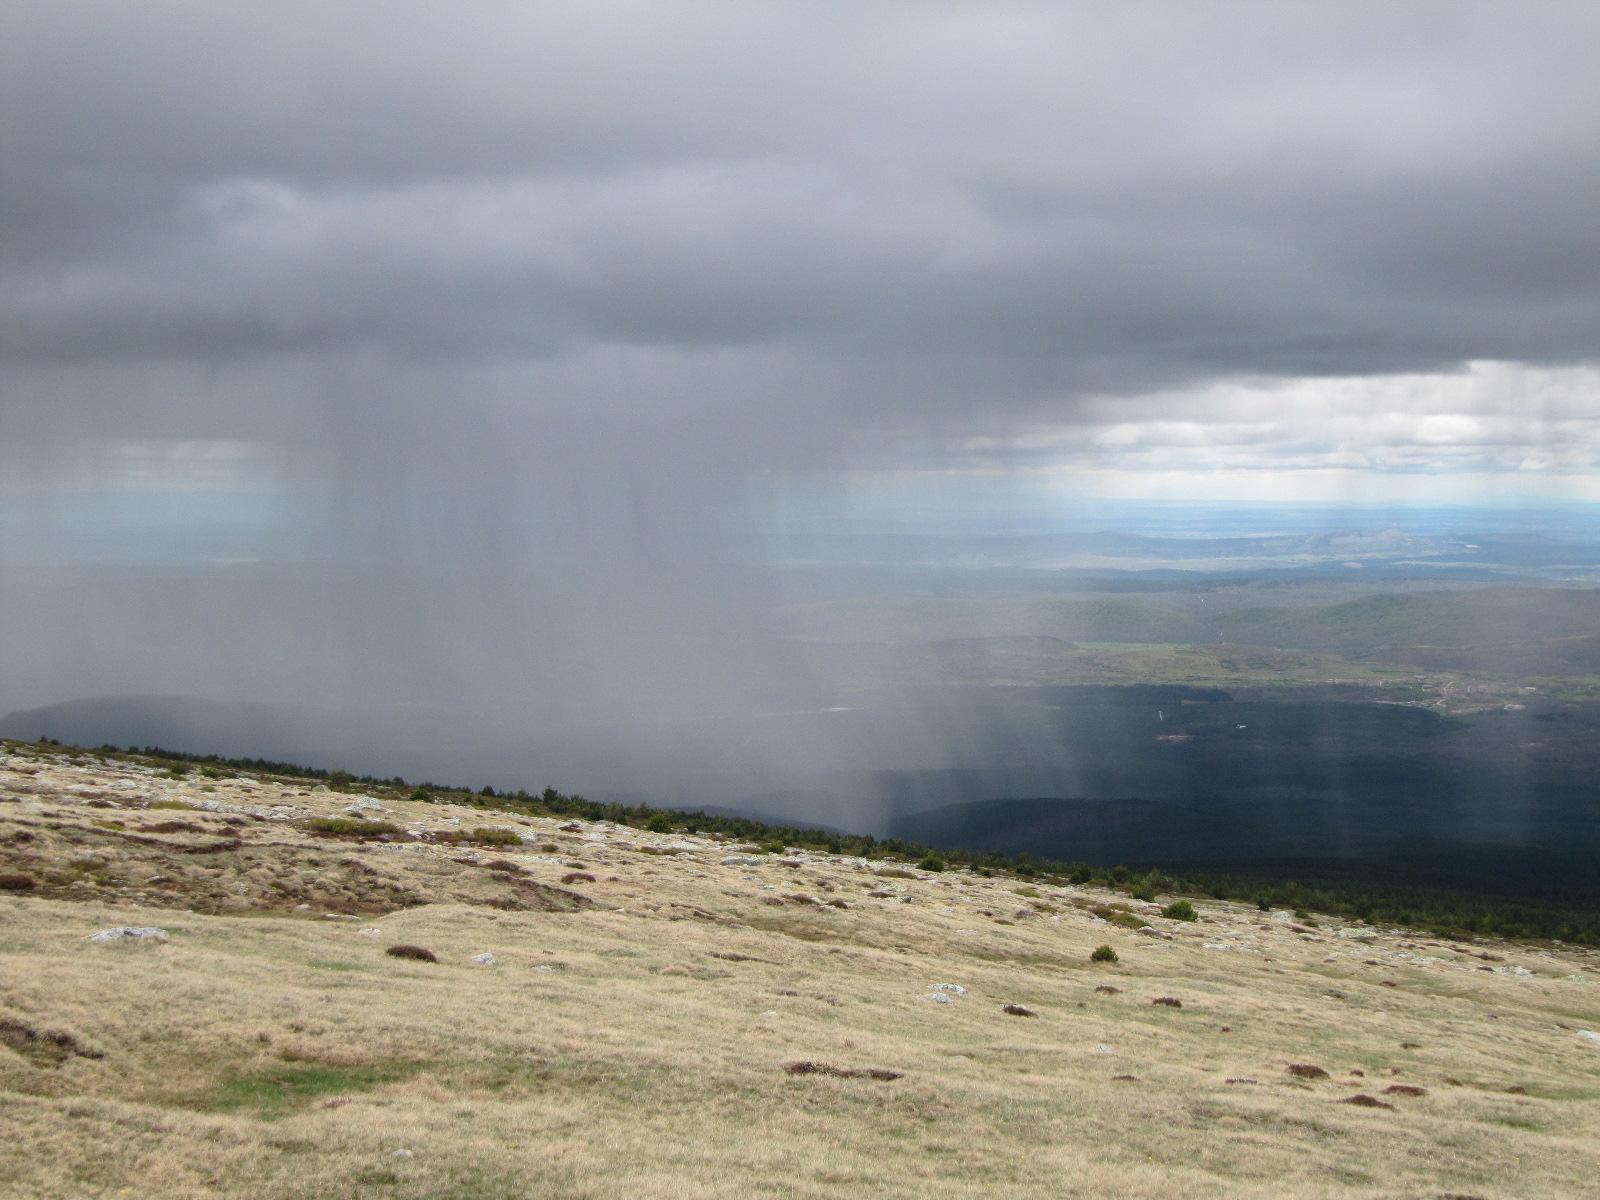 Paisaje de la Sierra de la Demanda. Autor, Carlos Pons